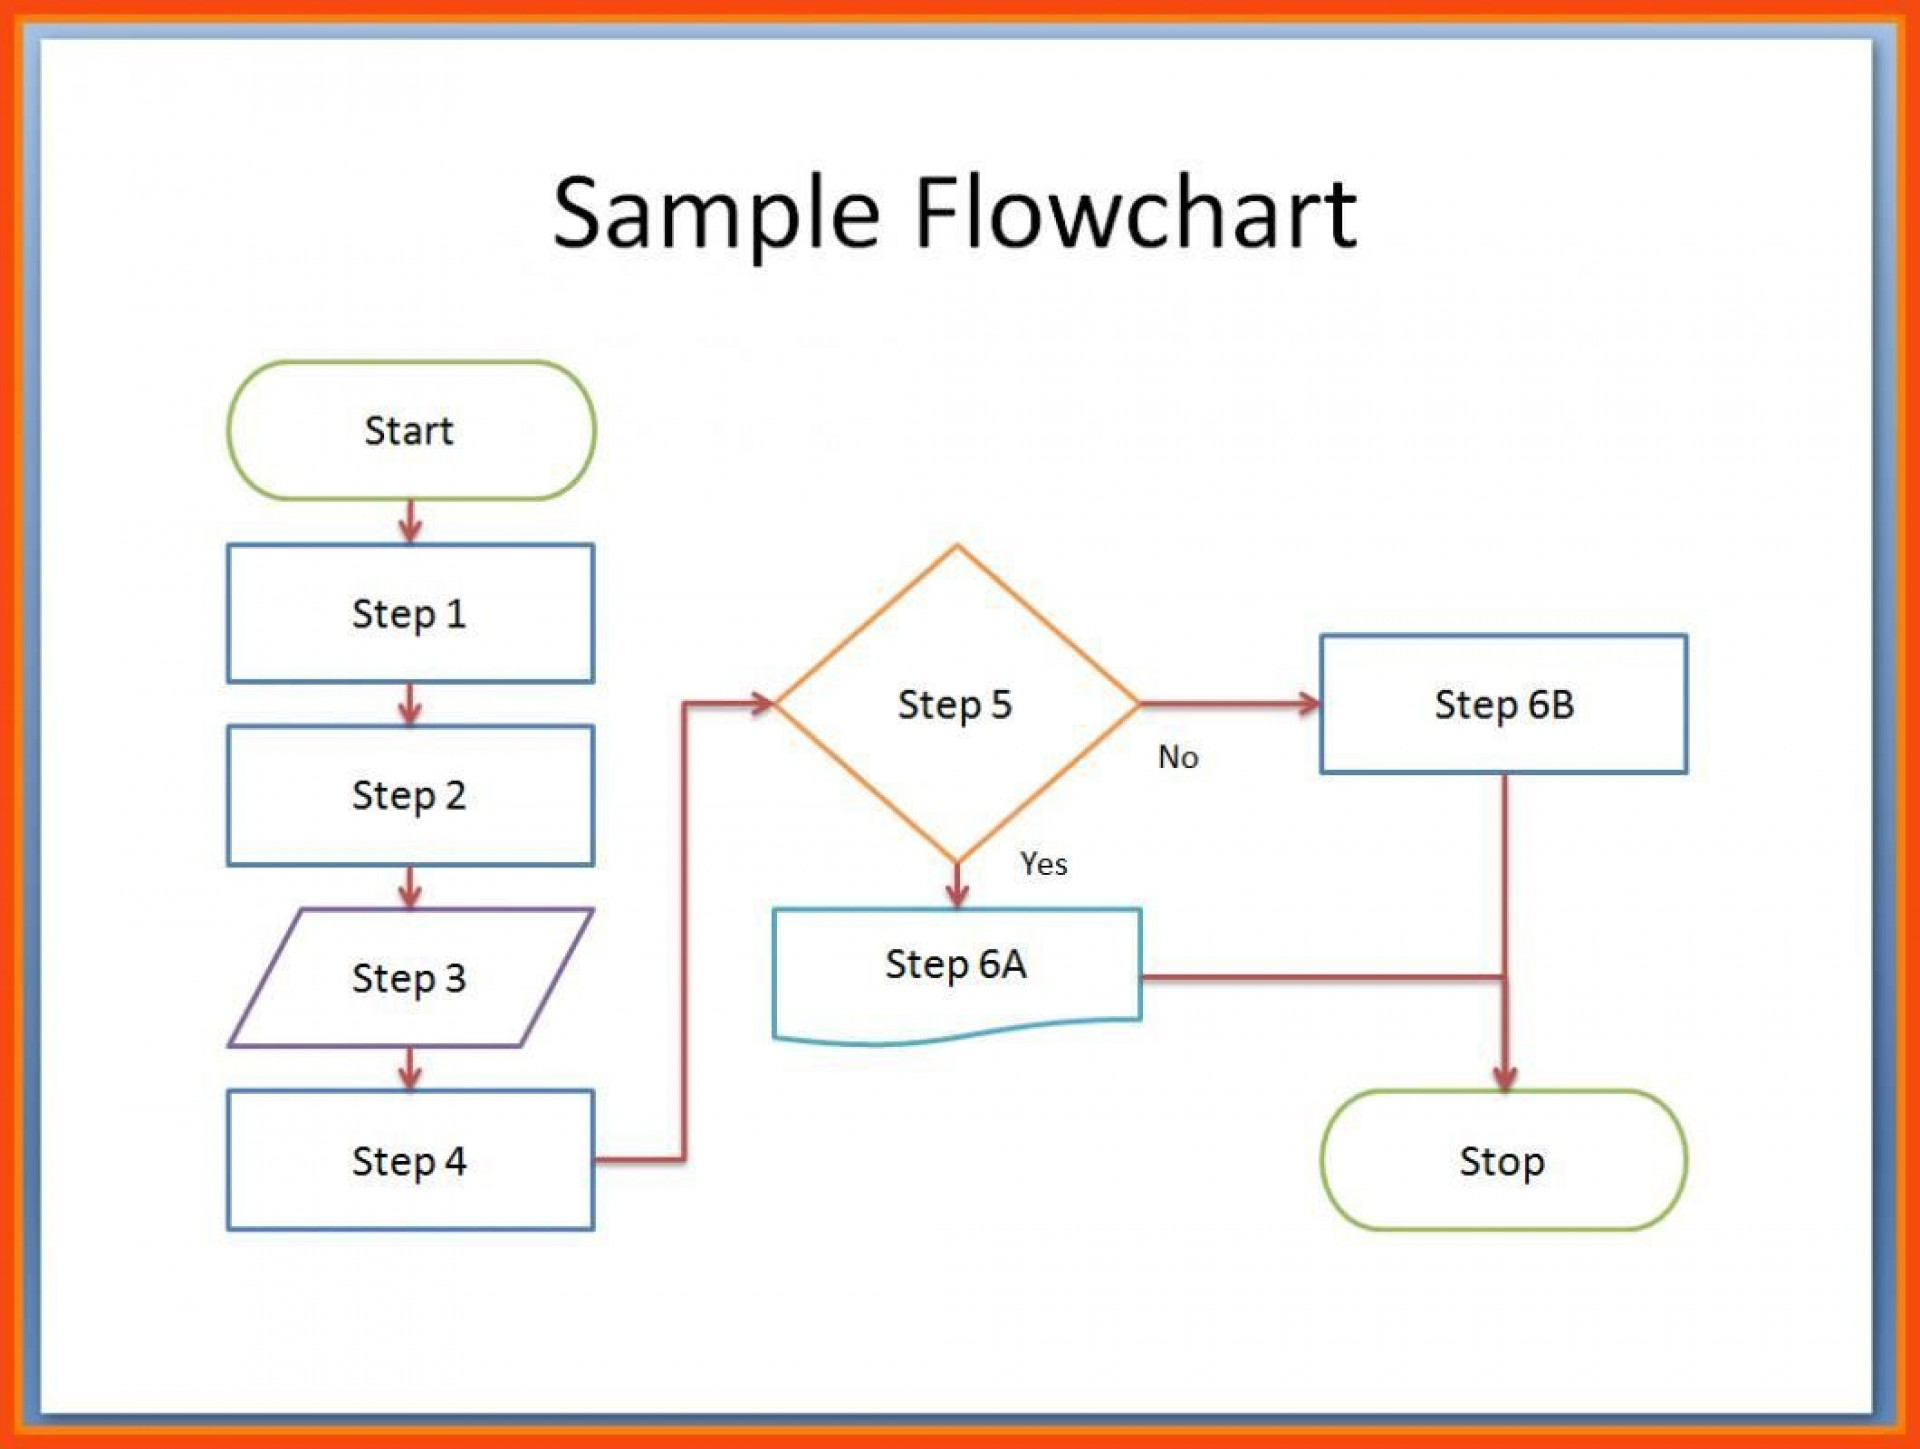 003 Unforgettable M Word Flow Chart Template High Definition  Microsoft Flowchart Download Free 20101920